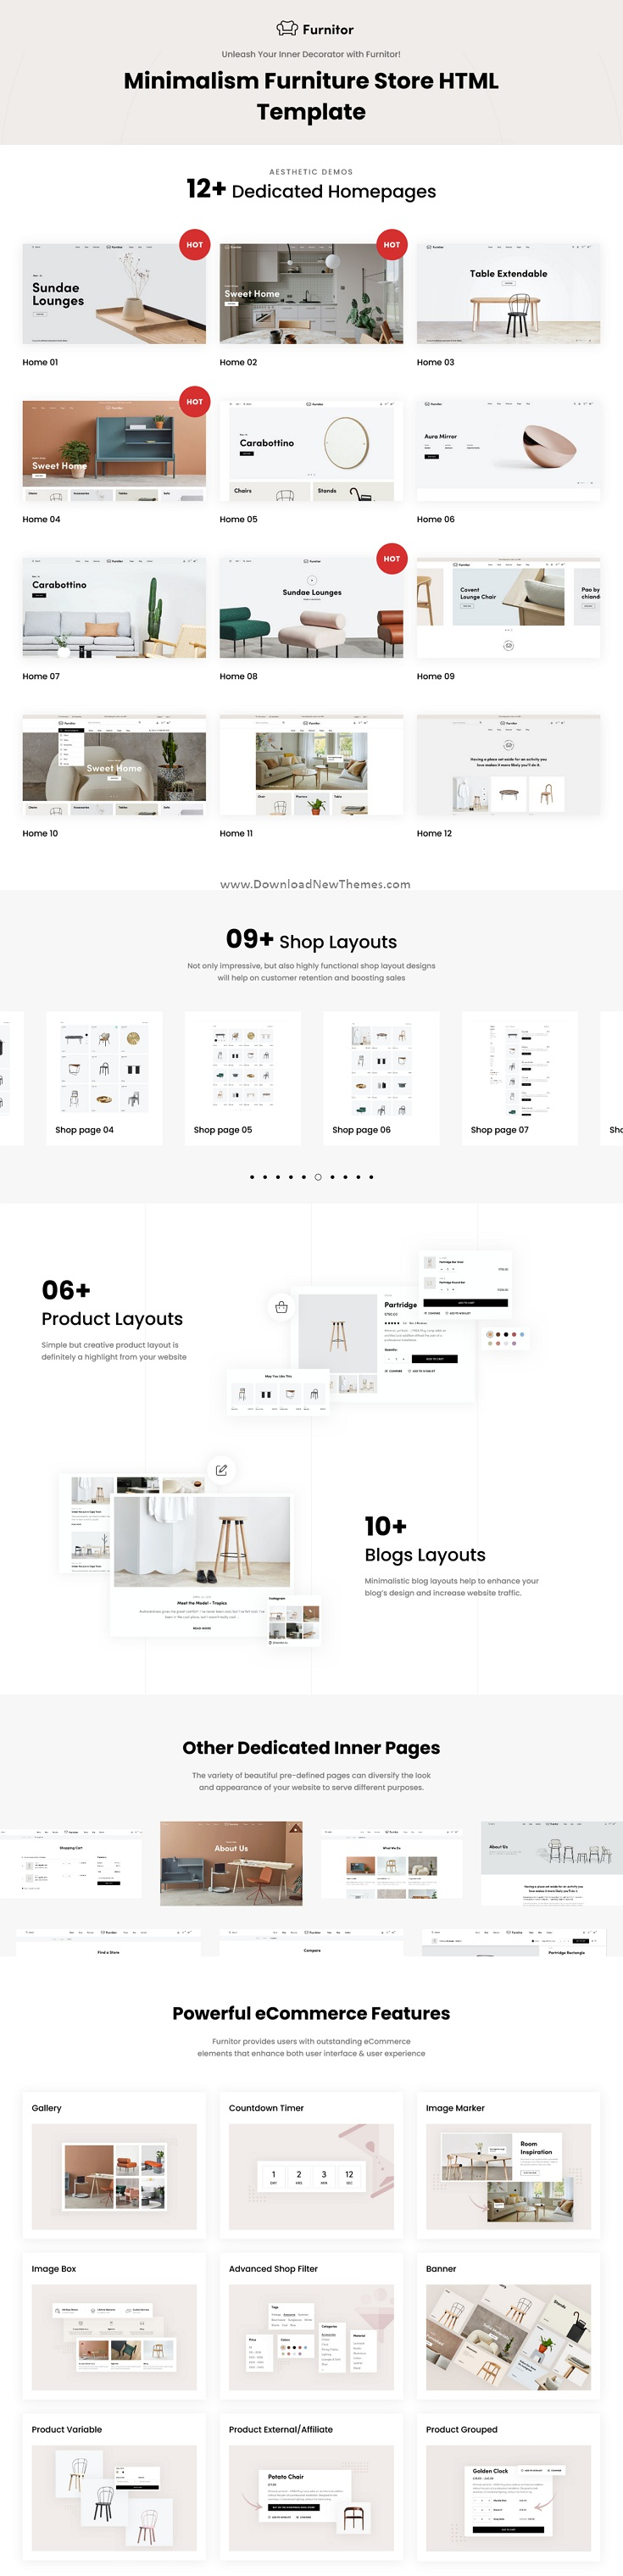 Furnitor - Minimalism Furniture Store HTML Template